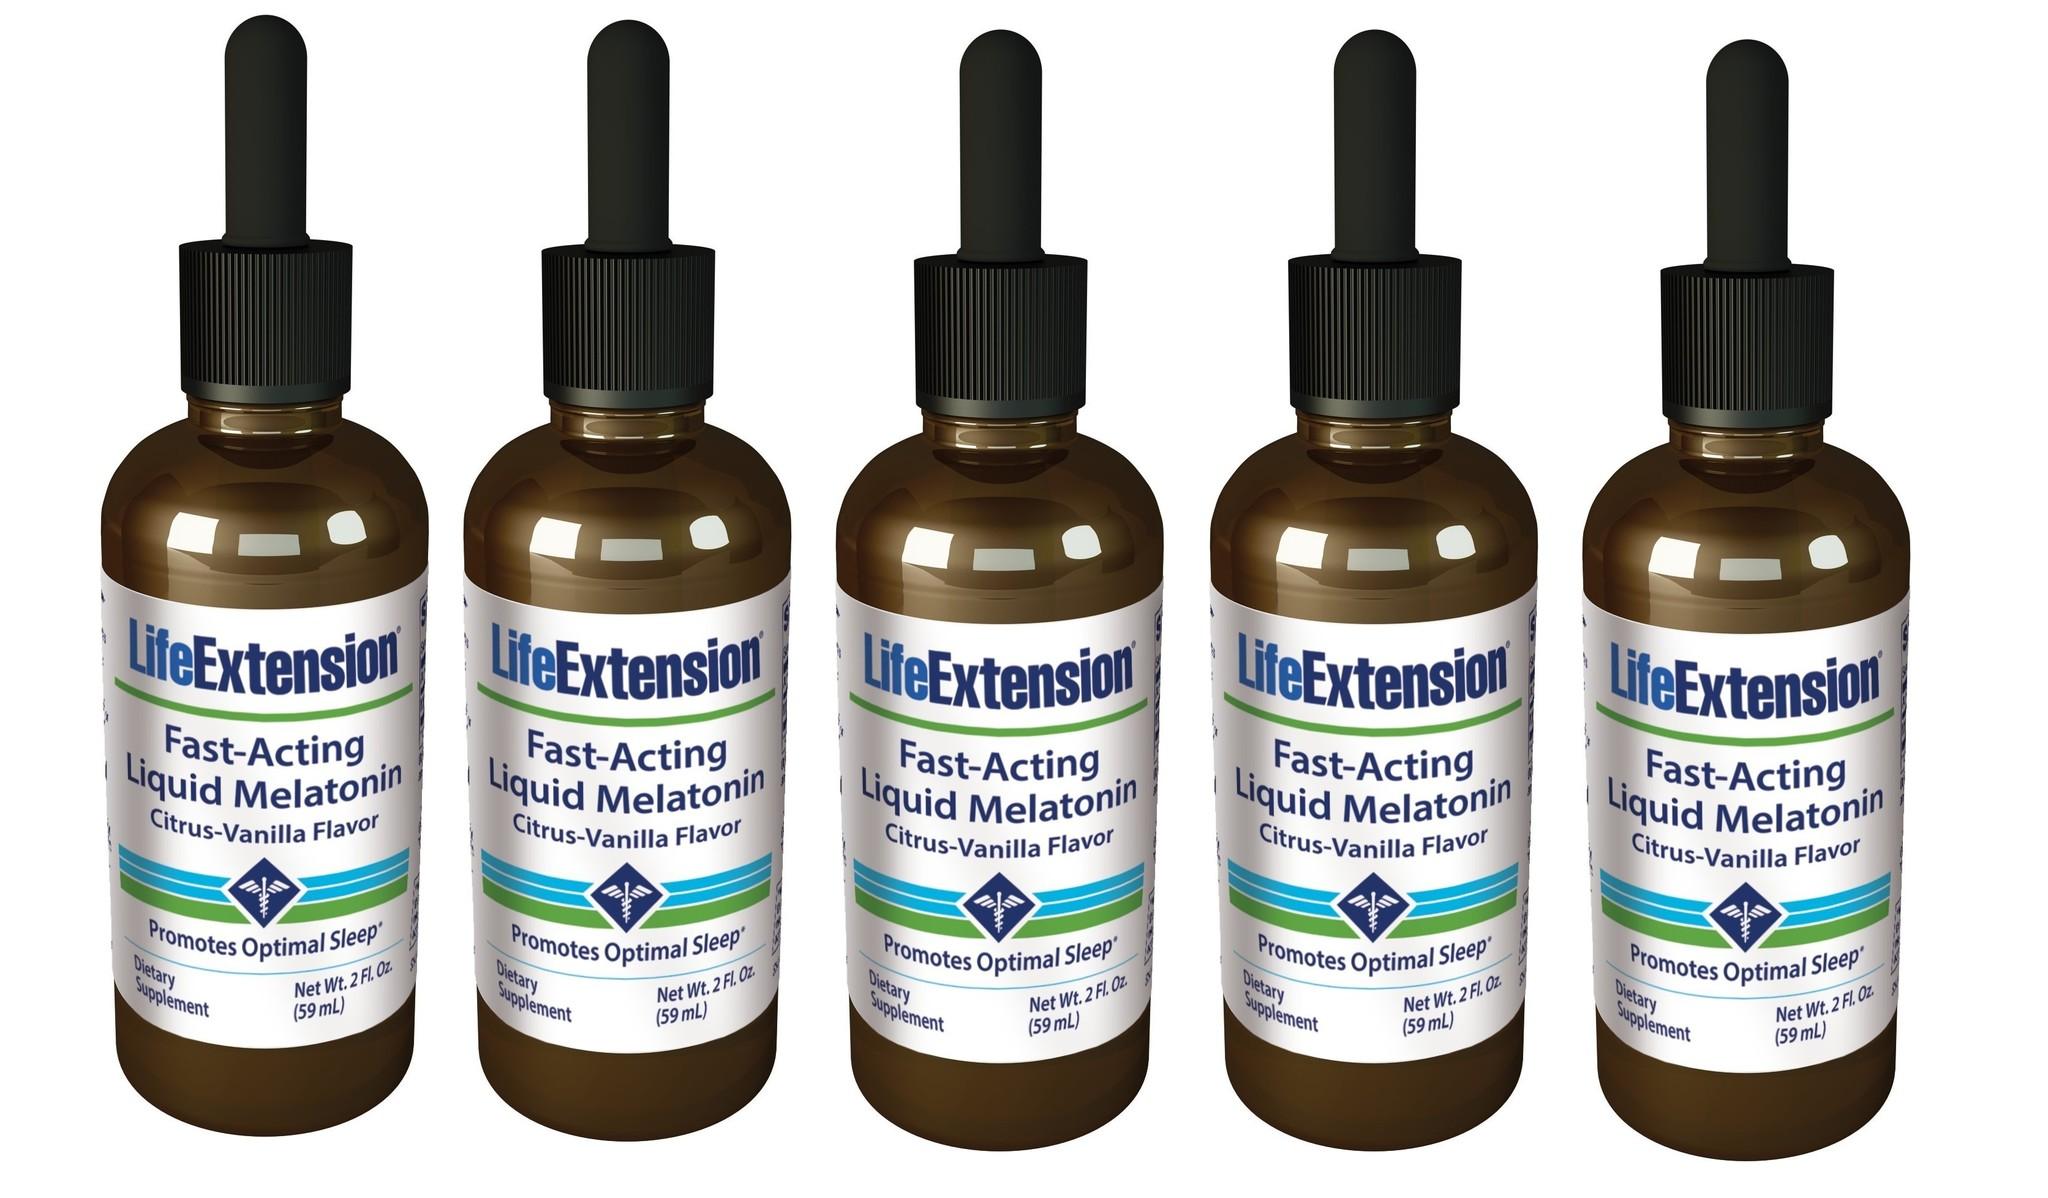 Life Extension Fast-Acting Liquid Melatonin, 3 Mg 2 Oz., 5-packs